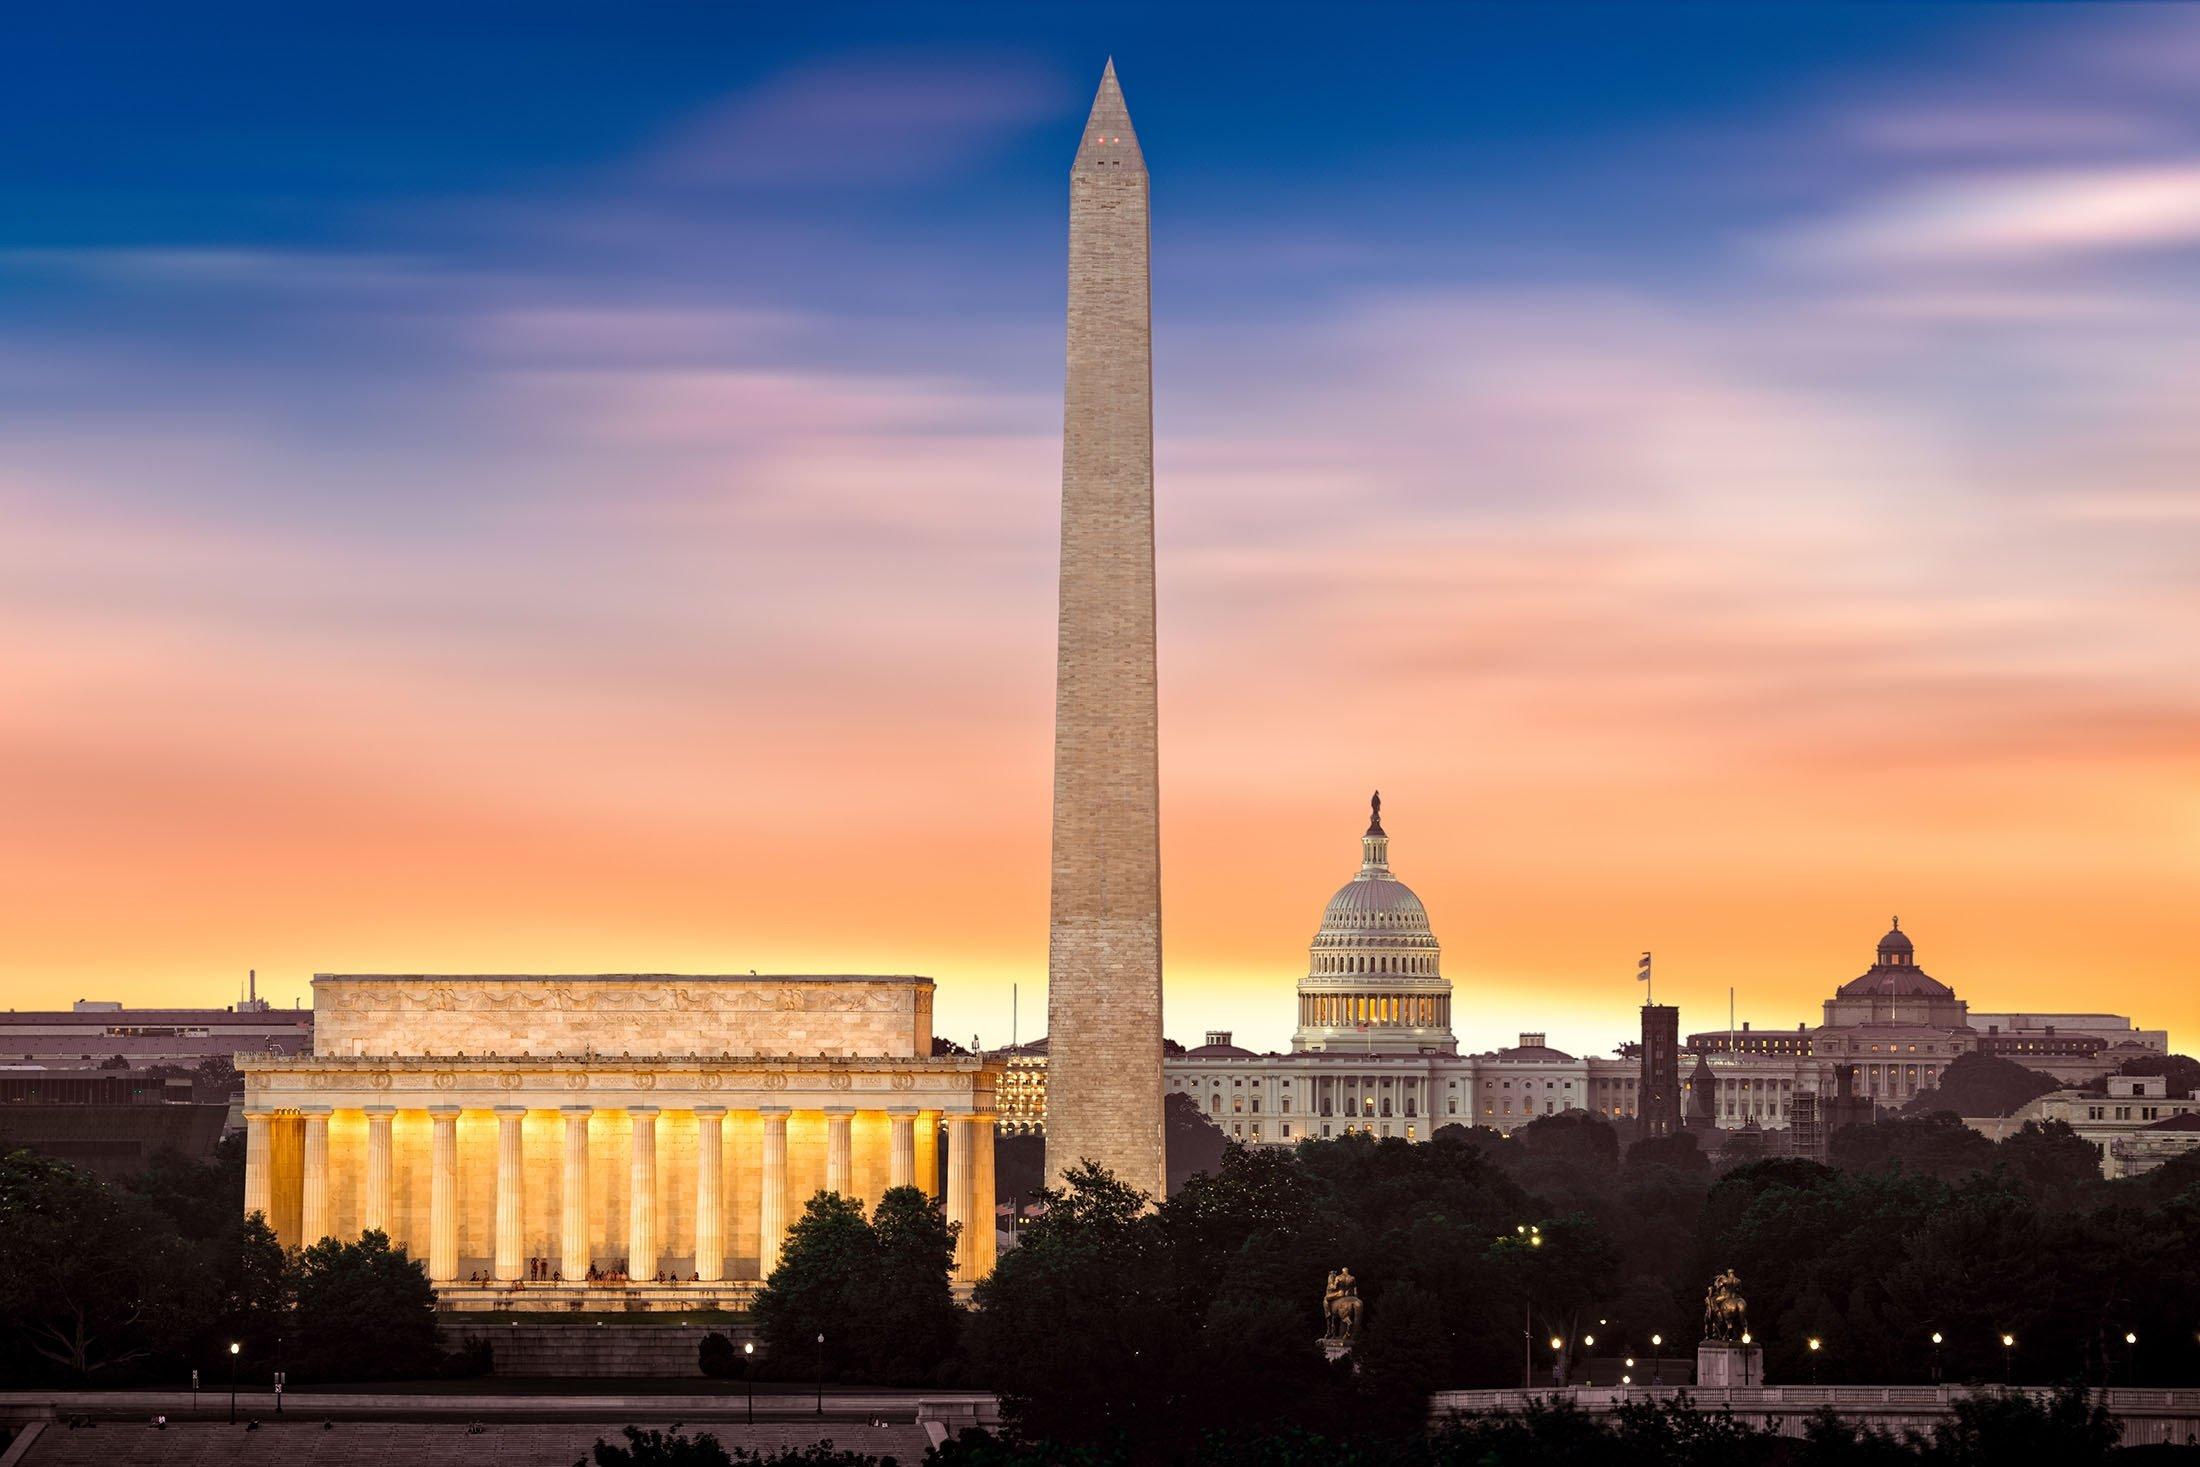 Sun dawns upon the three iconic monuments of Washington,Lincoln Memorial, Washington Monument and the Capitol Building, Washington, U.S. (Shutterstock Photo)